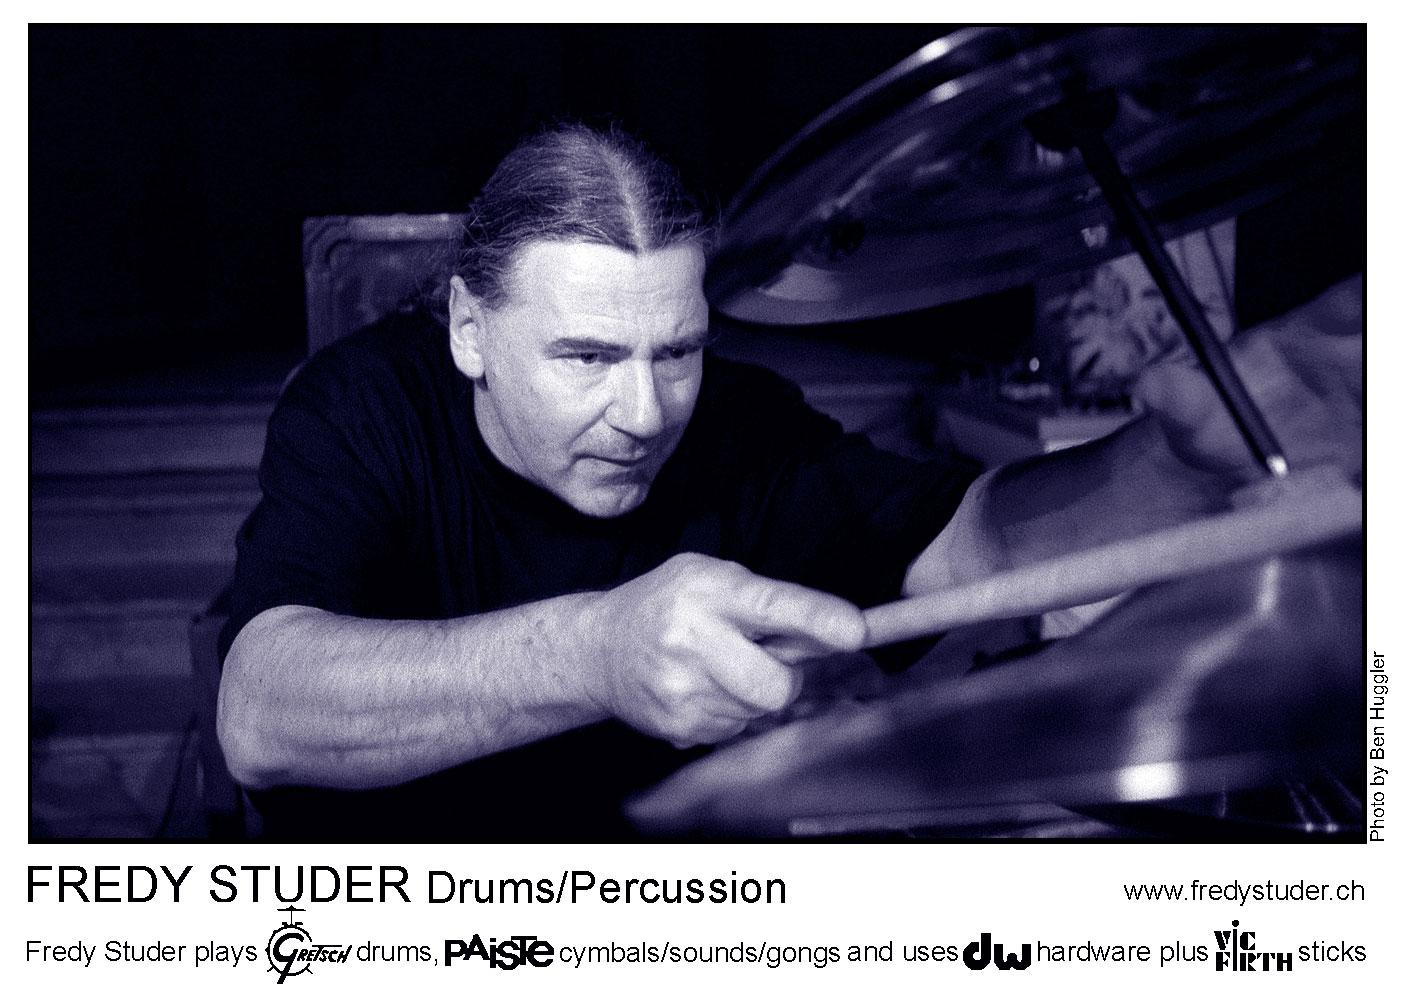 Fredy Studer